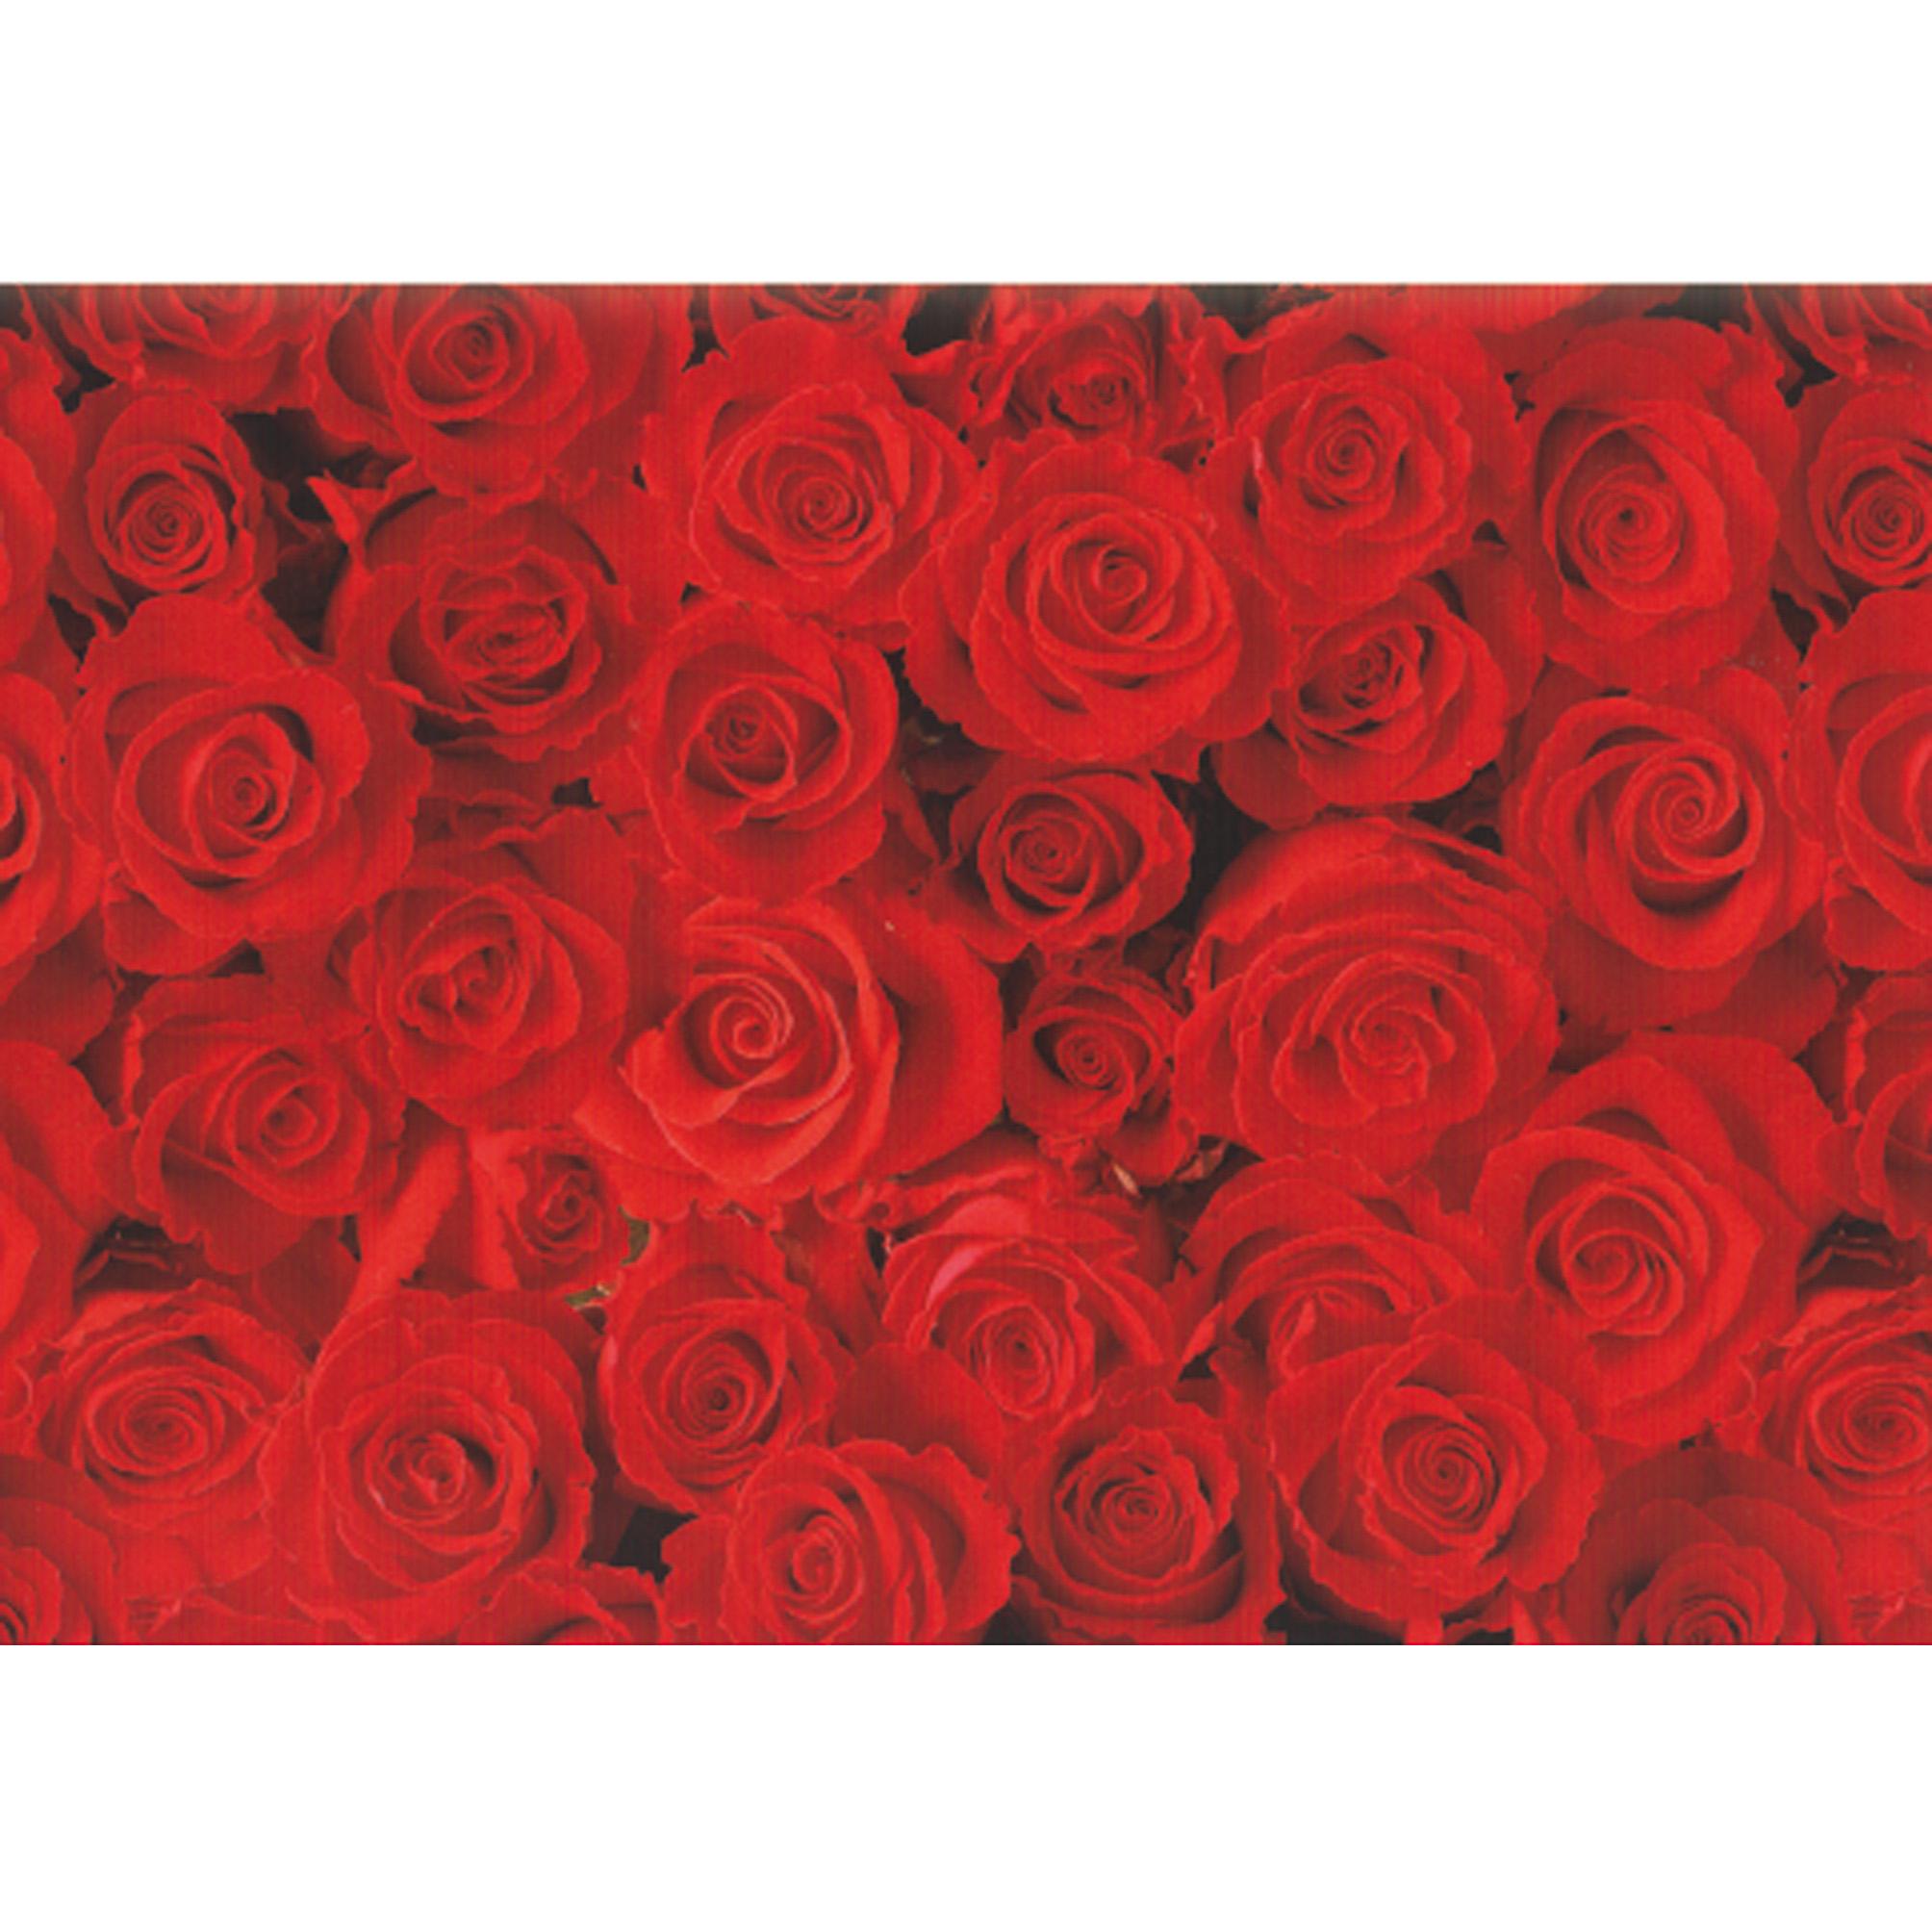 Hartie pt. ambalare 70 x 200cm/rola 70gr/mp model cu trandafiri rosii HERLITZ